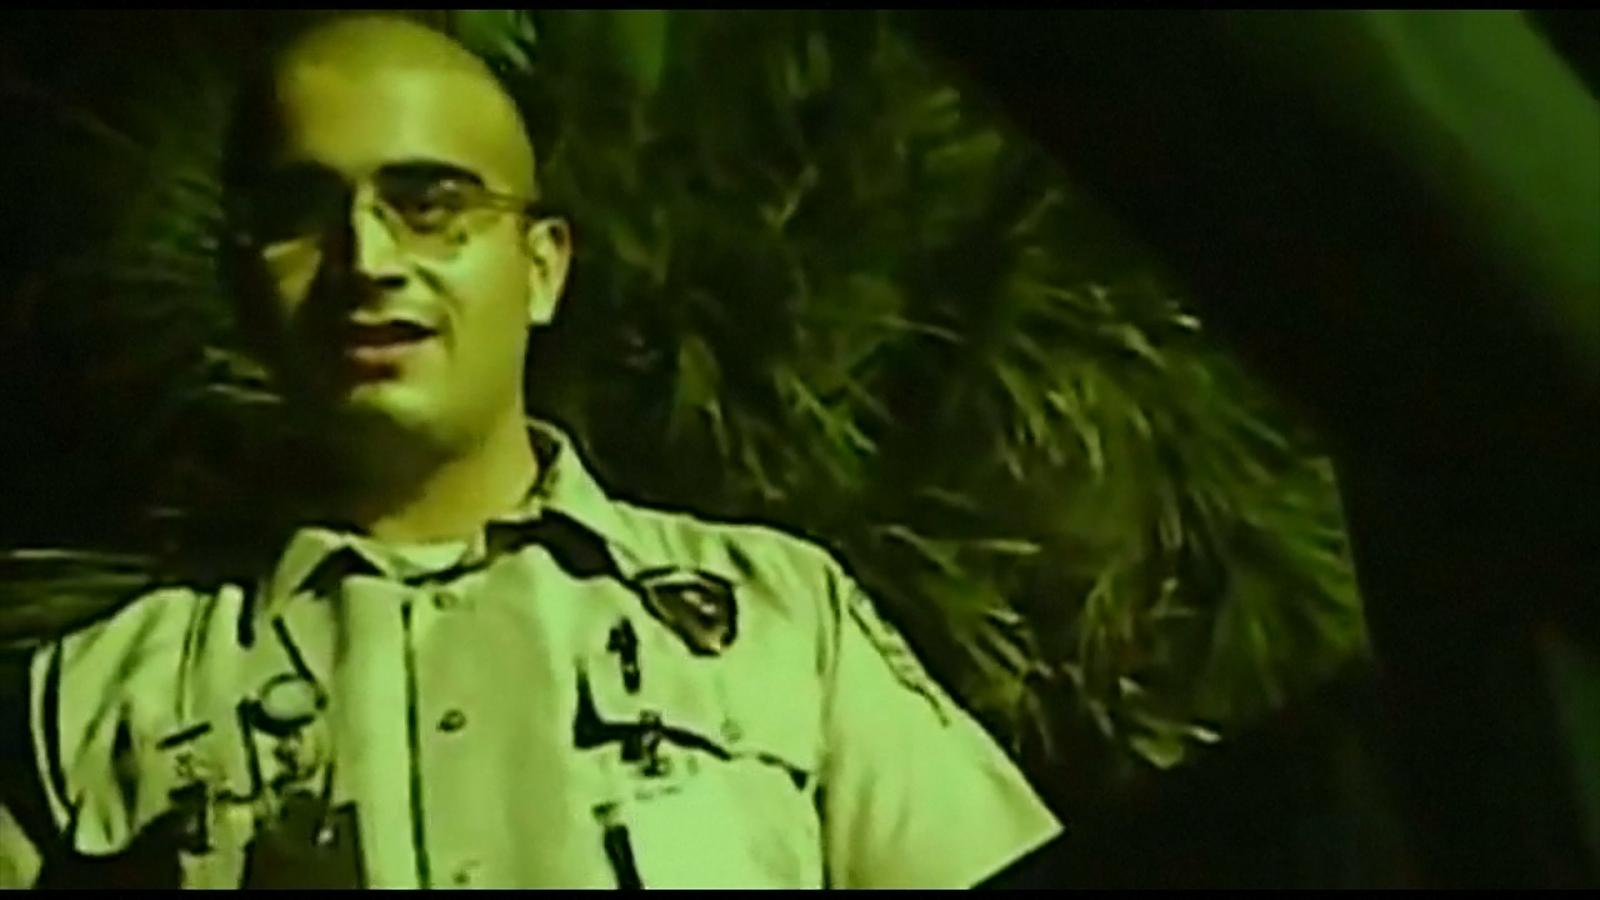 Orlando Gunman appears in BP documentary